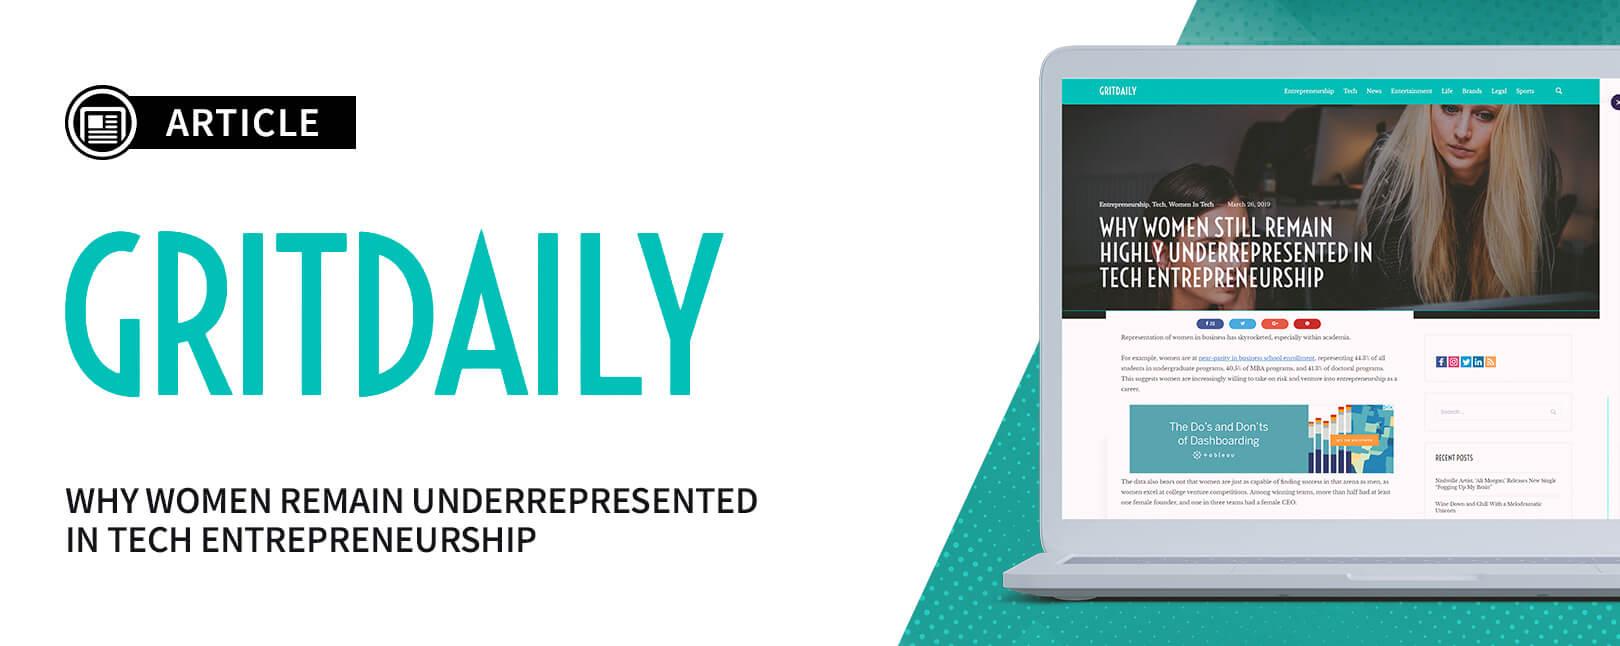 Why Women Remain Underrepresented in Tech Entrepreneurship-fb